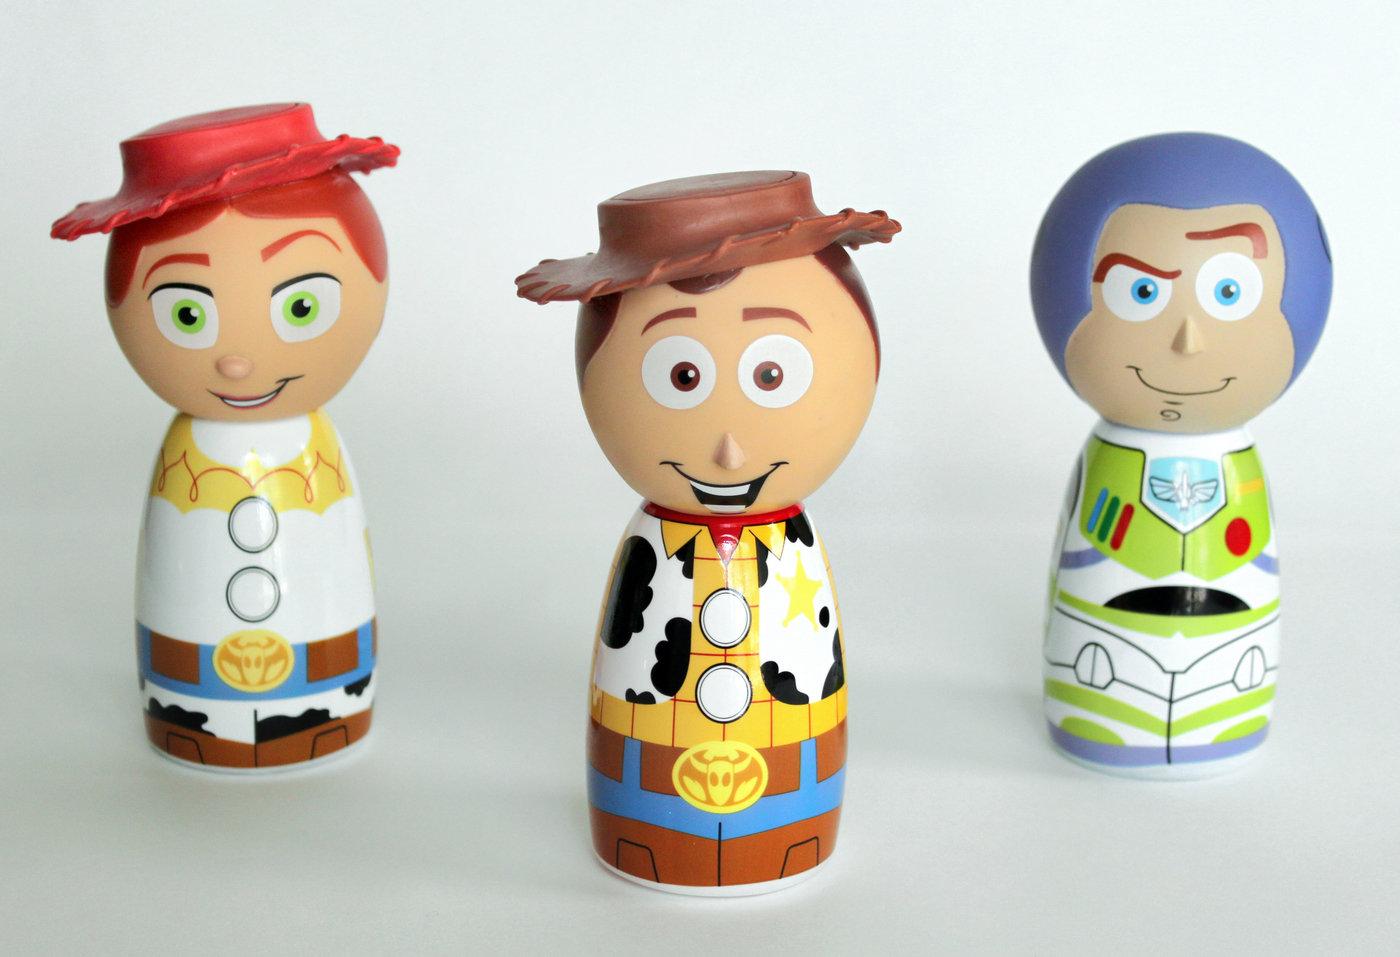 Toy Story Bathroom Set | medicalassistantschoolsedu.com